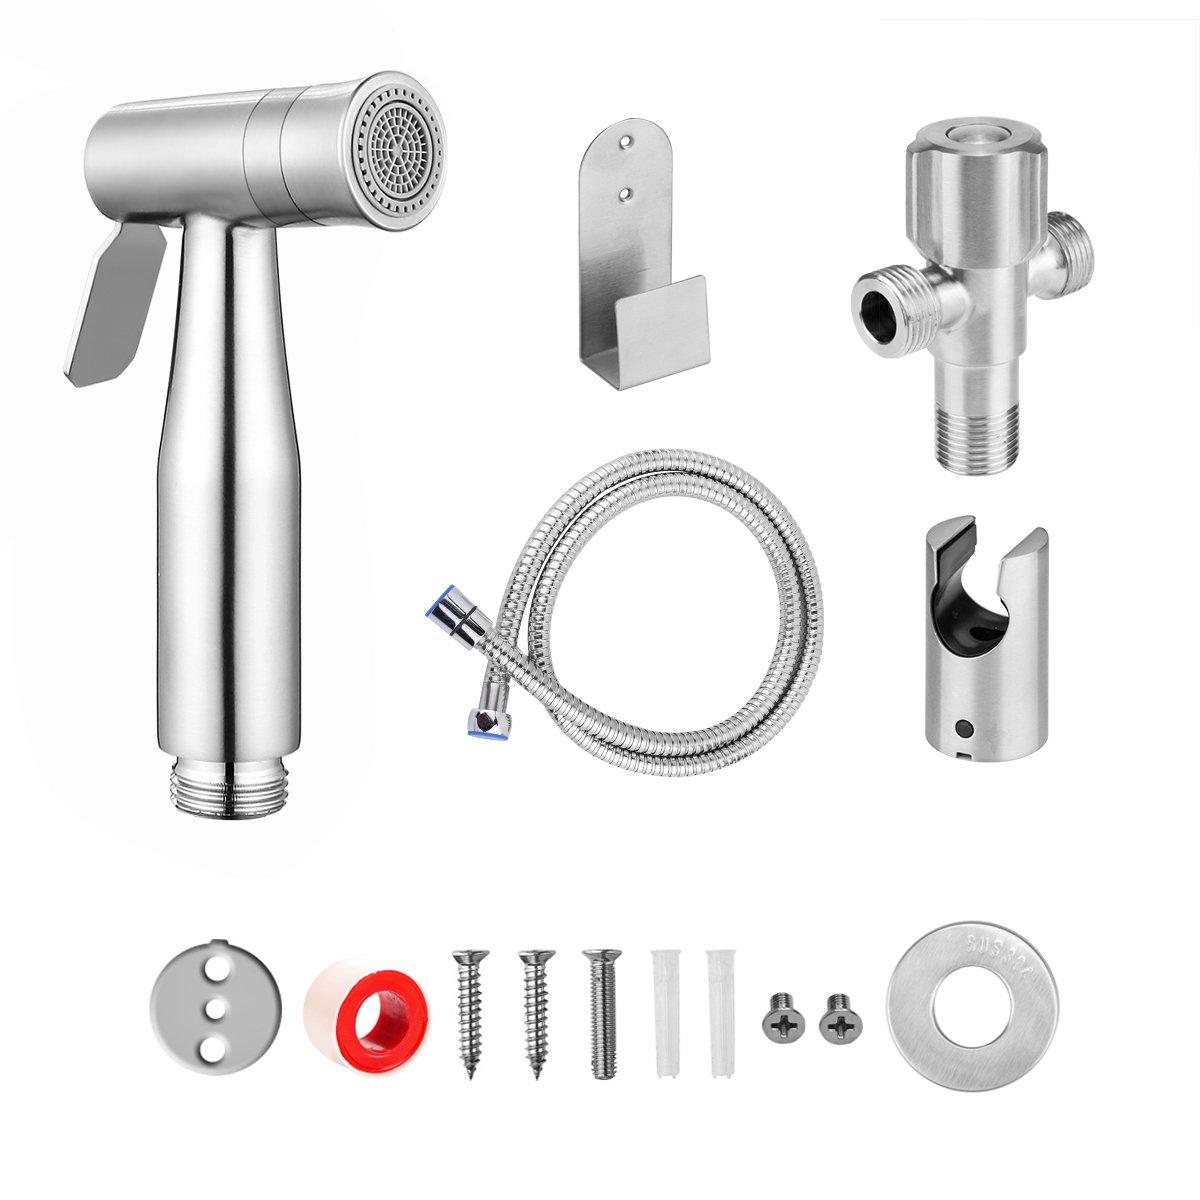 AOZBZ Toilet Hand Held Bidet Sprayer Kit, Bathroom Shower Bidet Tap Shattaf Spray Faucet Cloth Diaper Cleaning with Hose, Tee G1/2 Connectors, Bracket Holder, Holder Hook